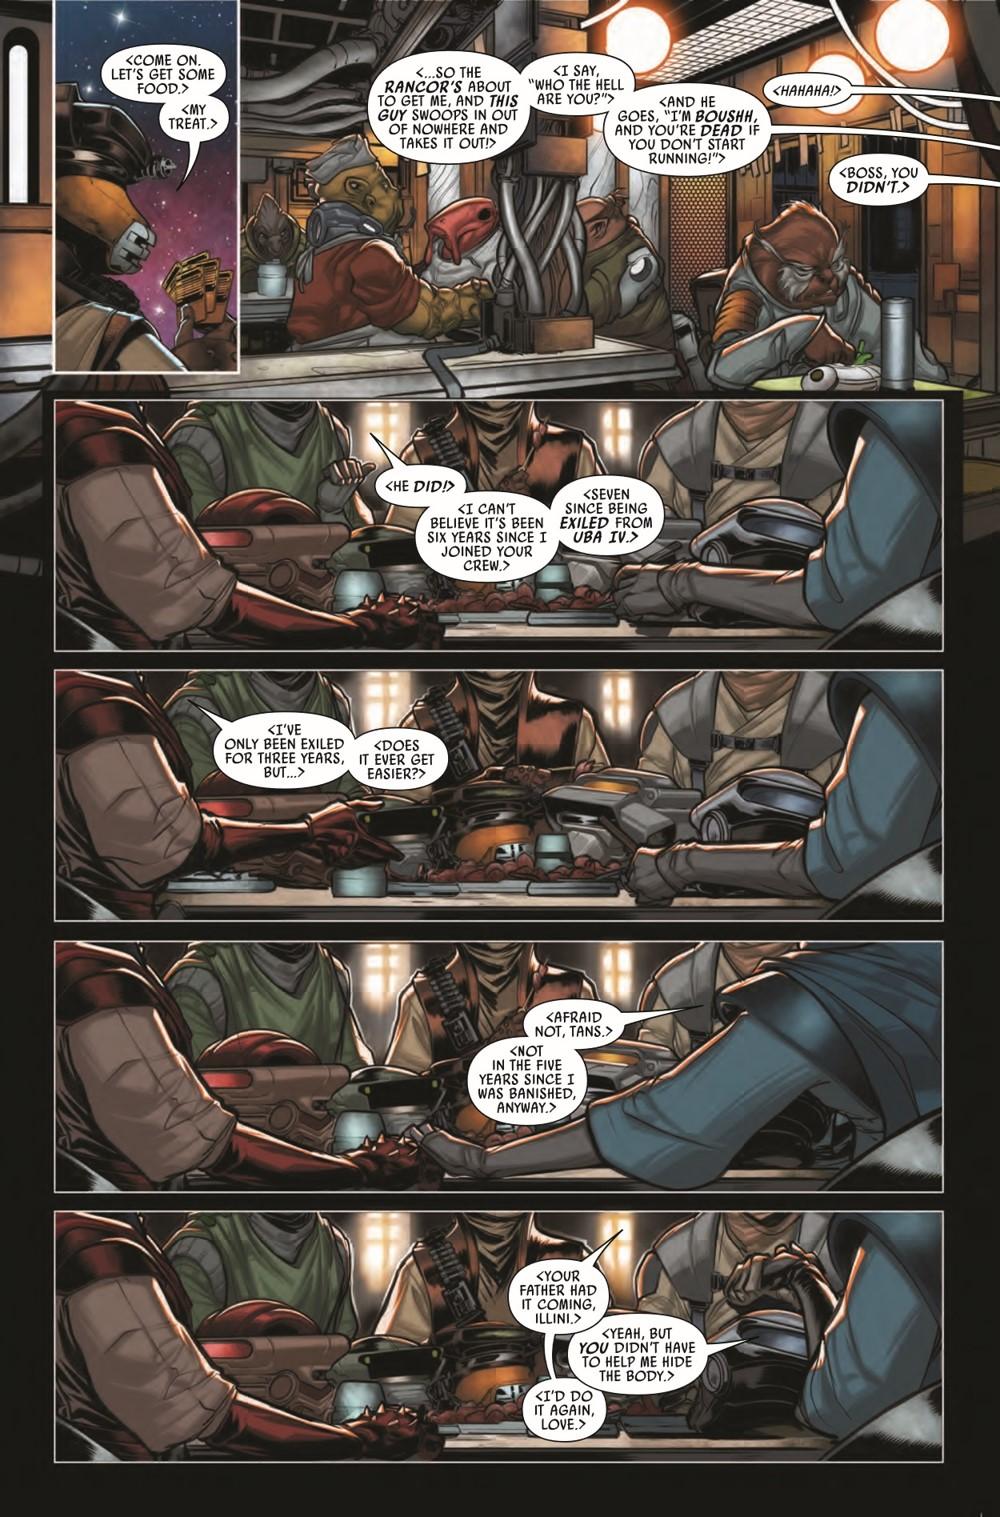 STWWAROTBHBOUSHH2021001_Preview-6 ComicList Previews: STAR WARS WAR OF THE BOUNTY HUNTERS BOUSHH #1